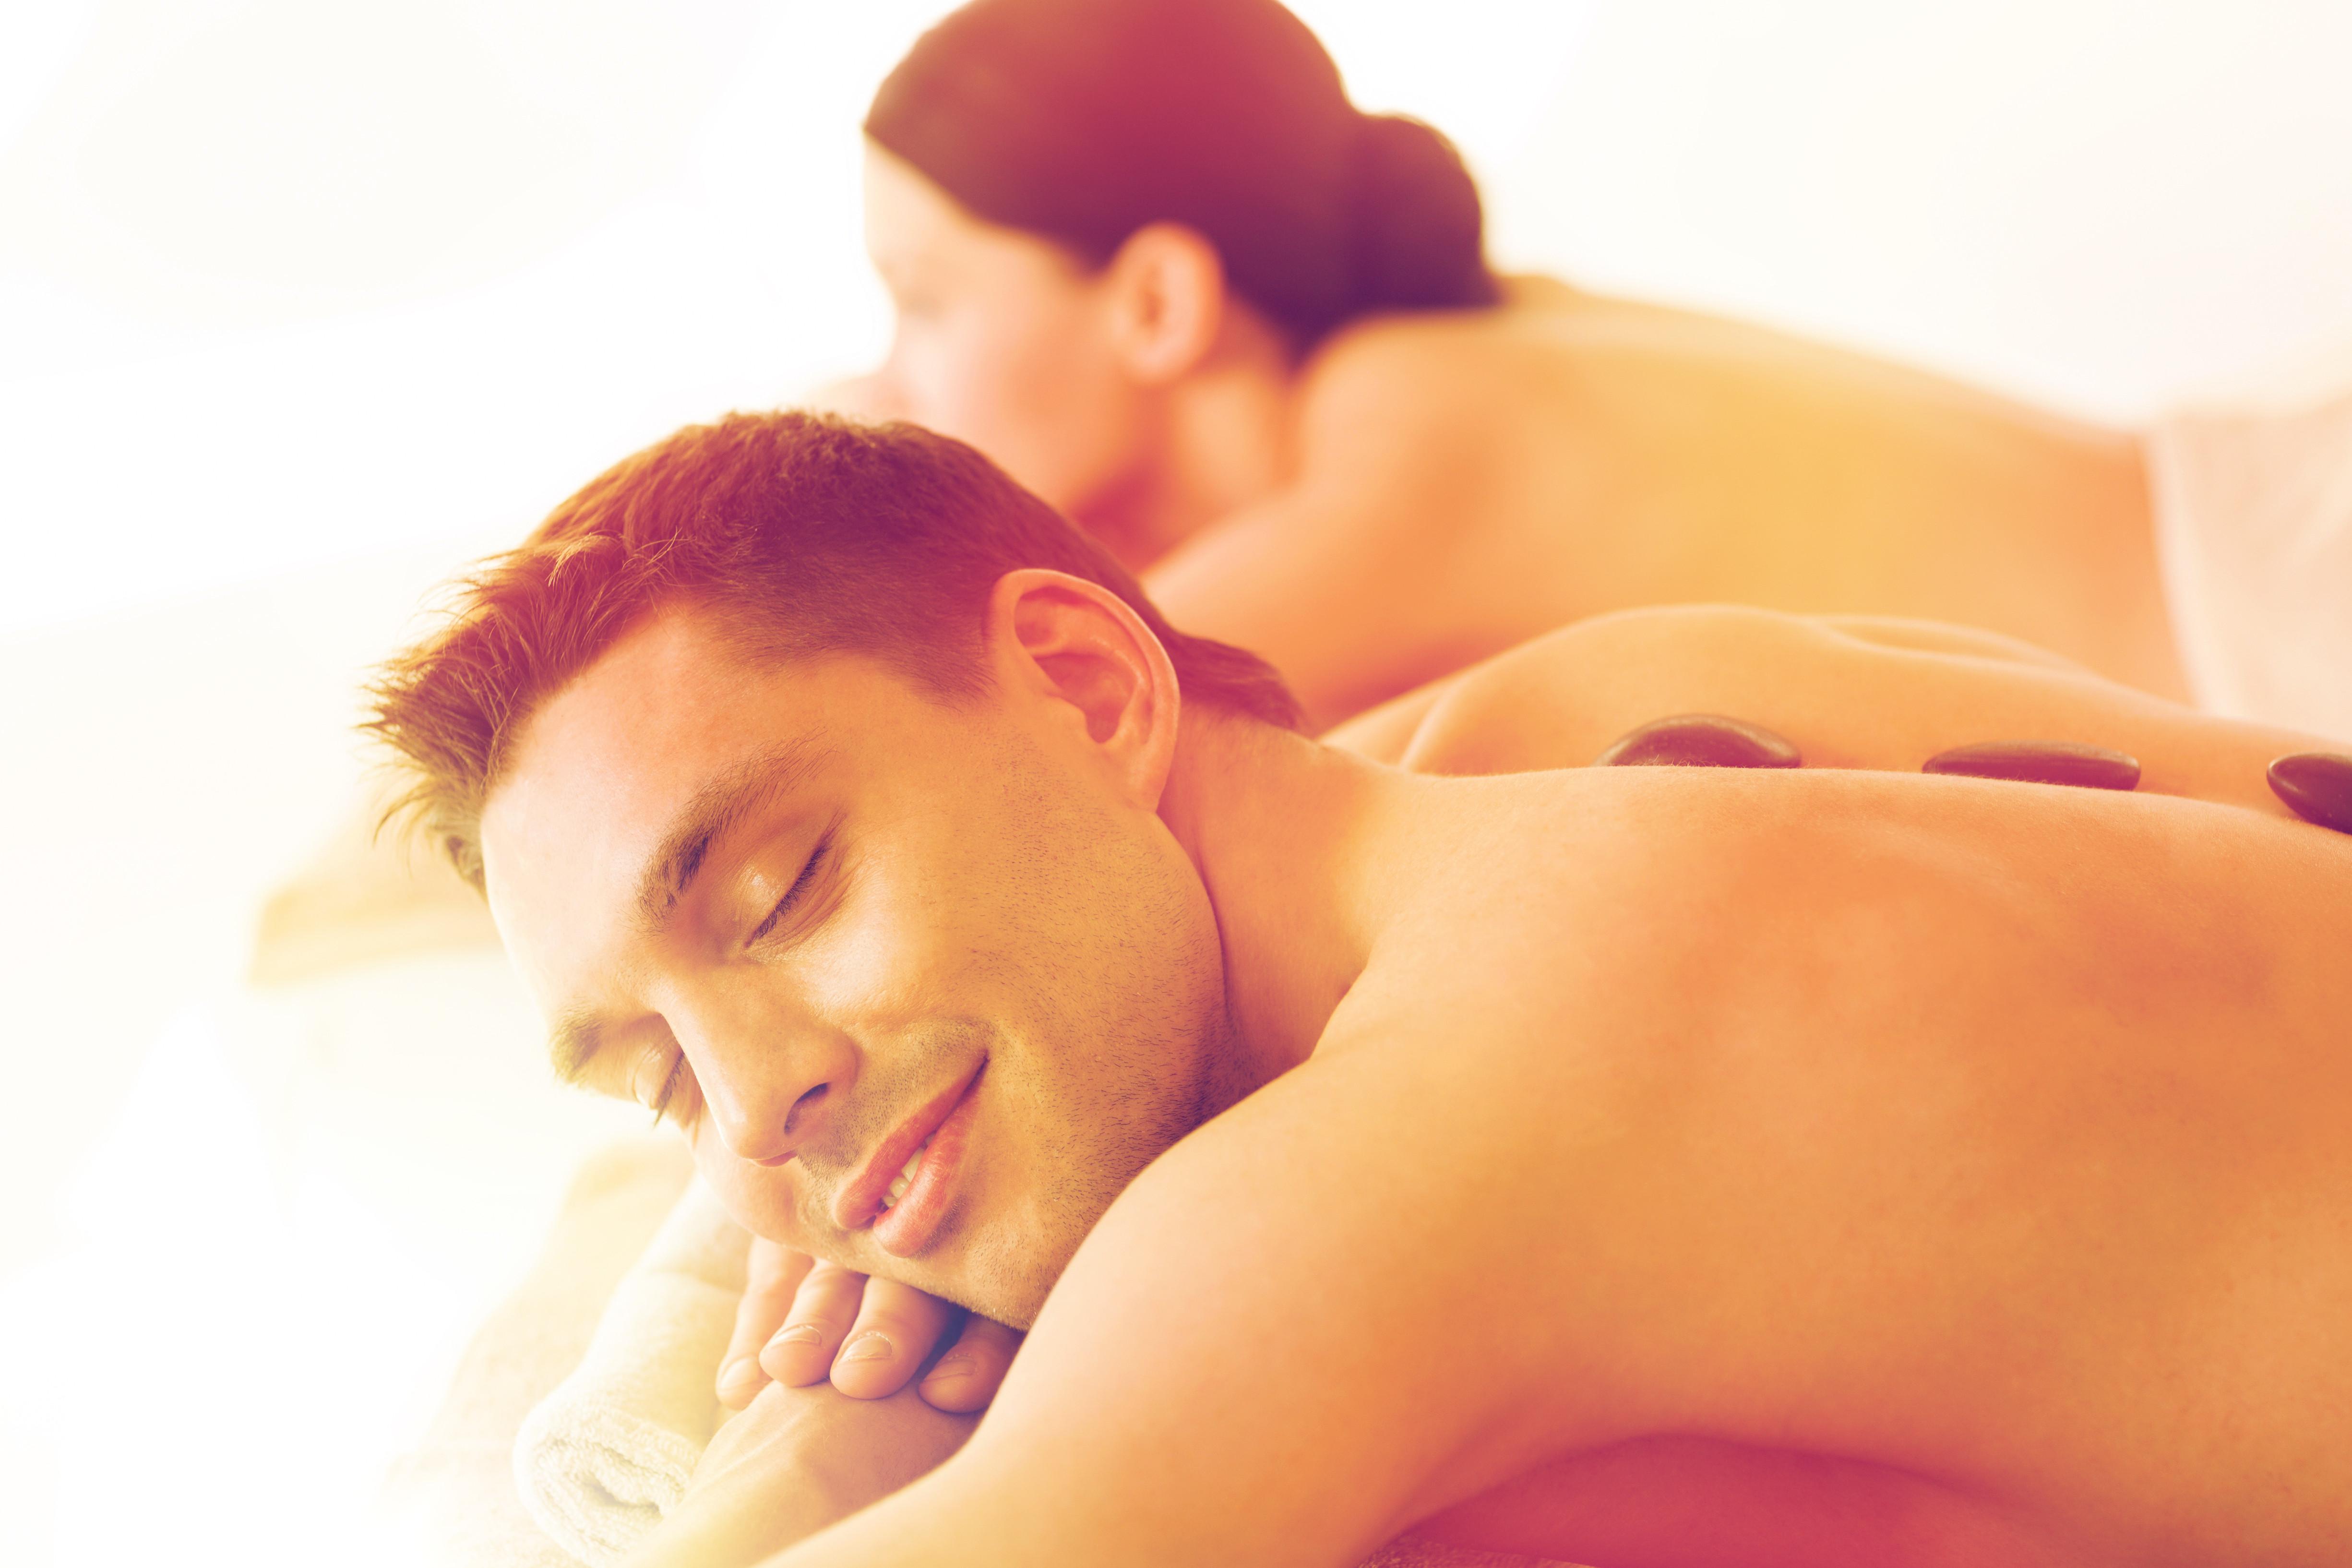 Couple's Massage Package - 75 min